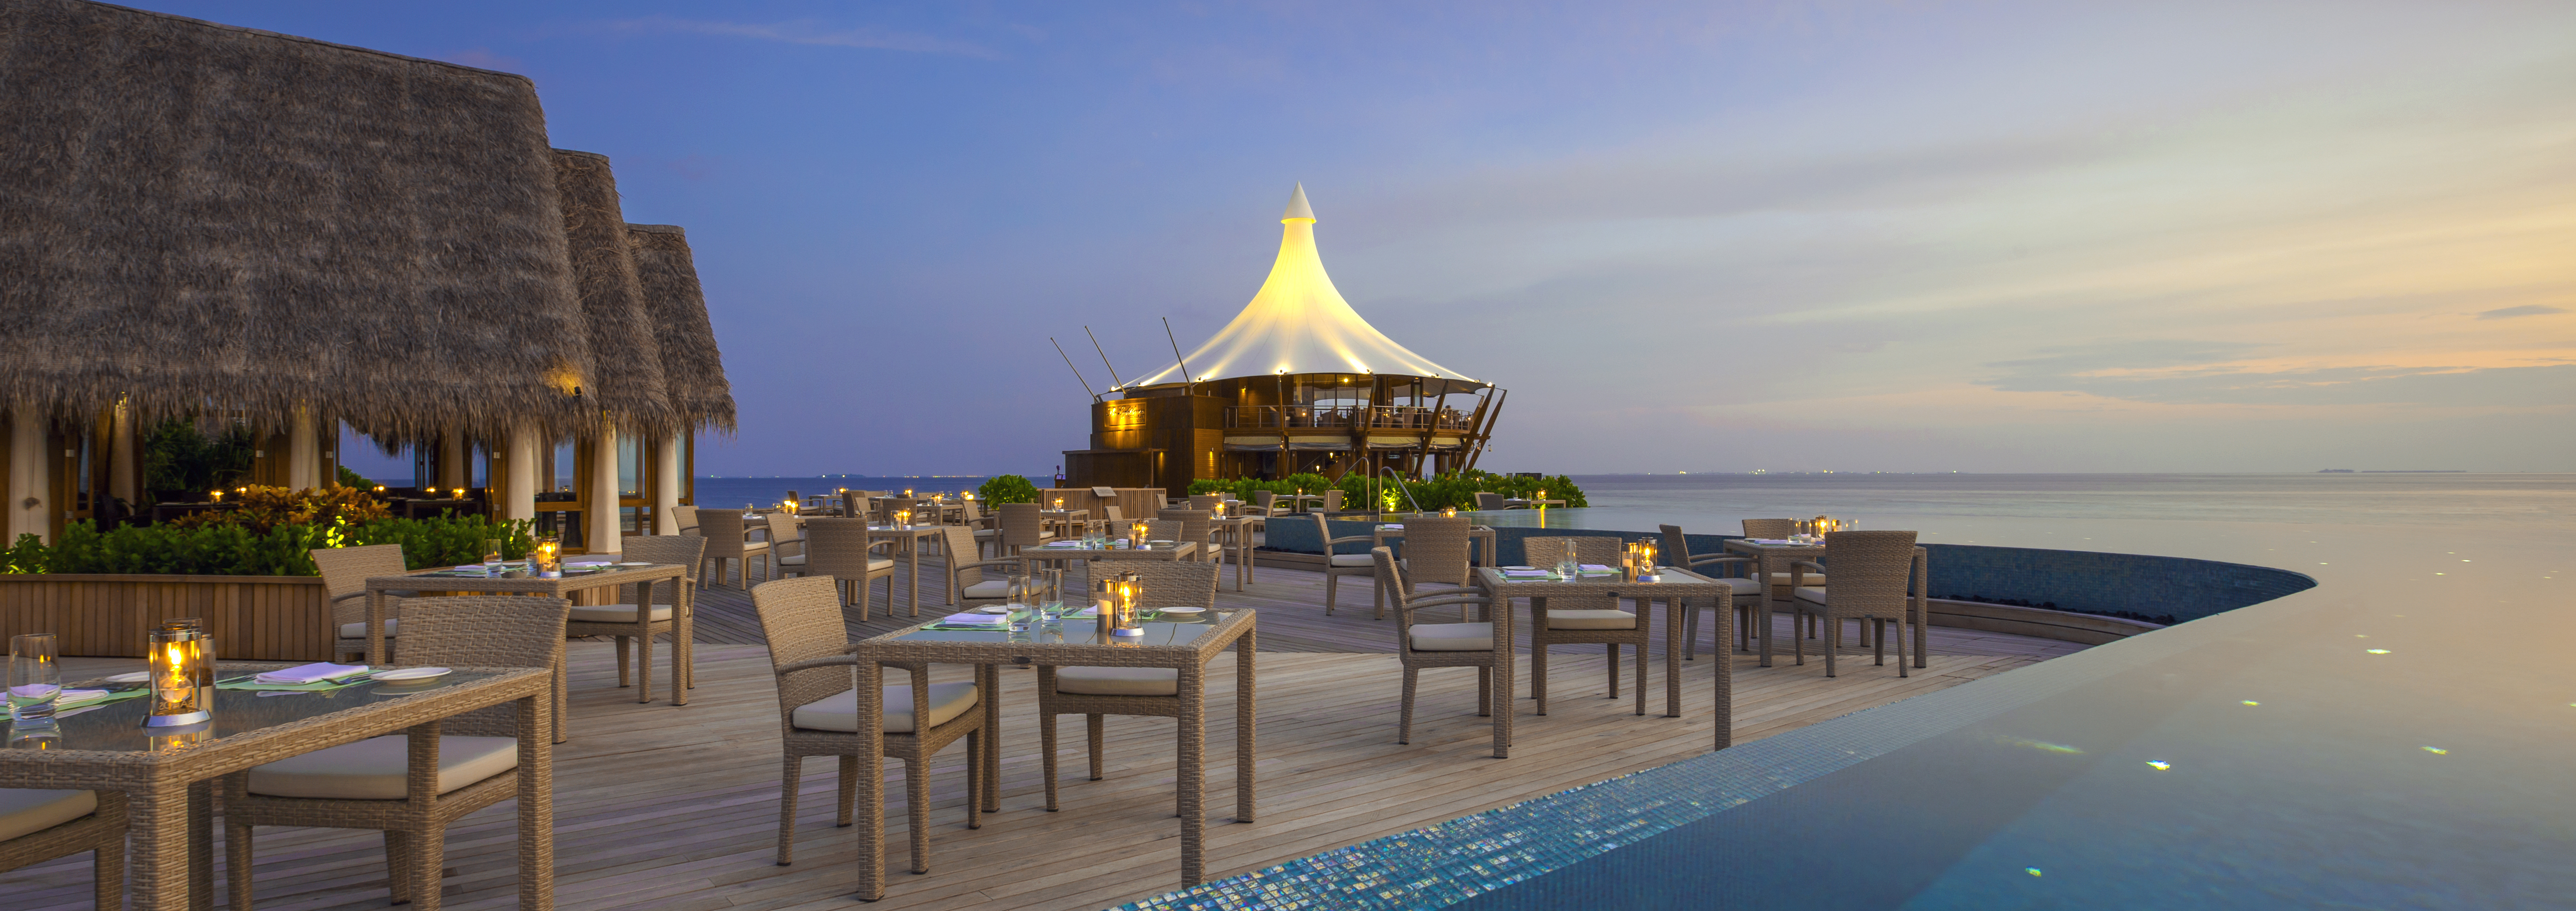 Baros-Maldives-Lime-Restaurant